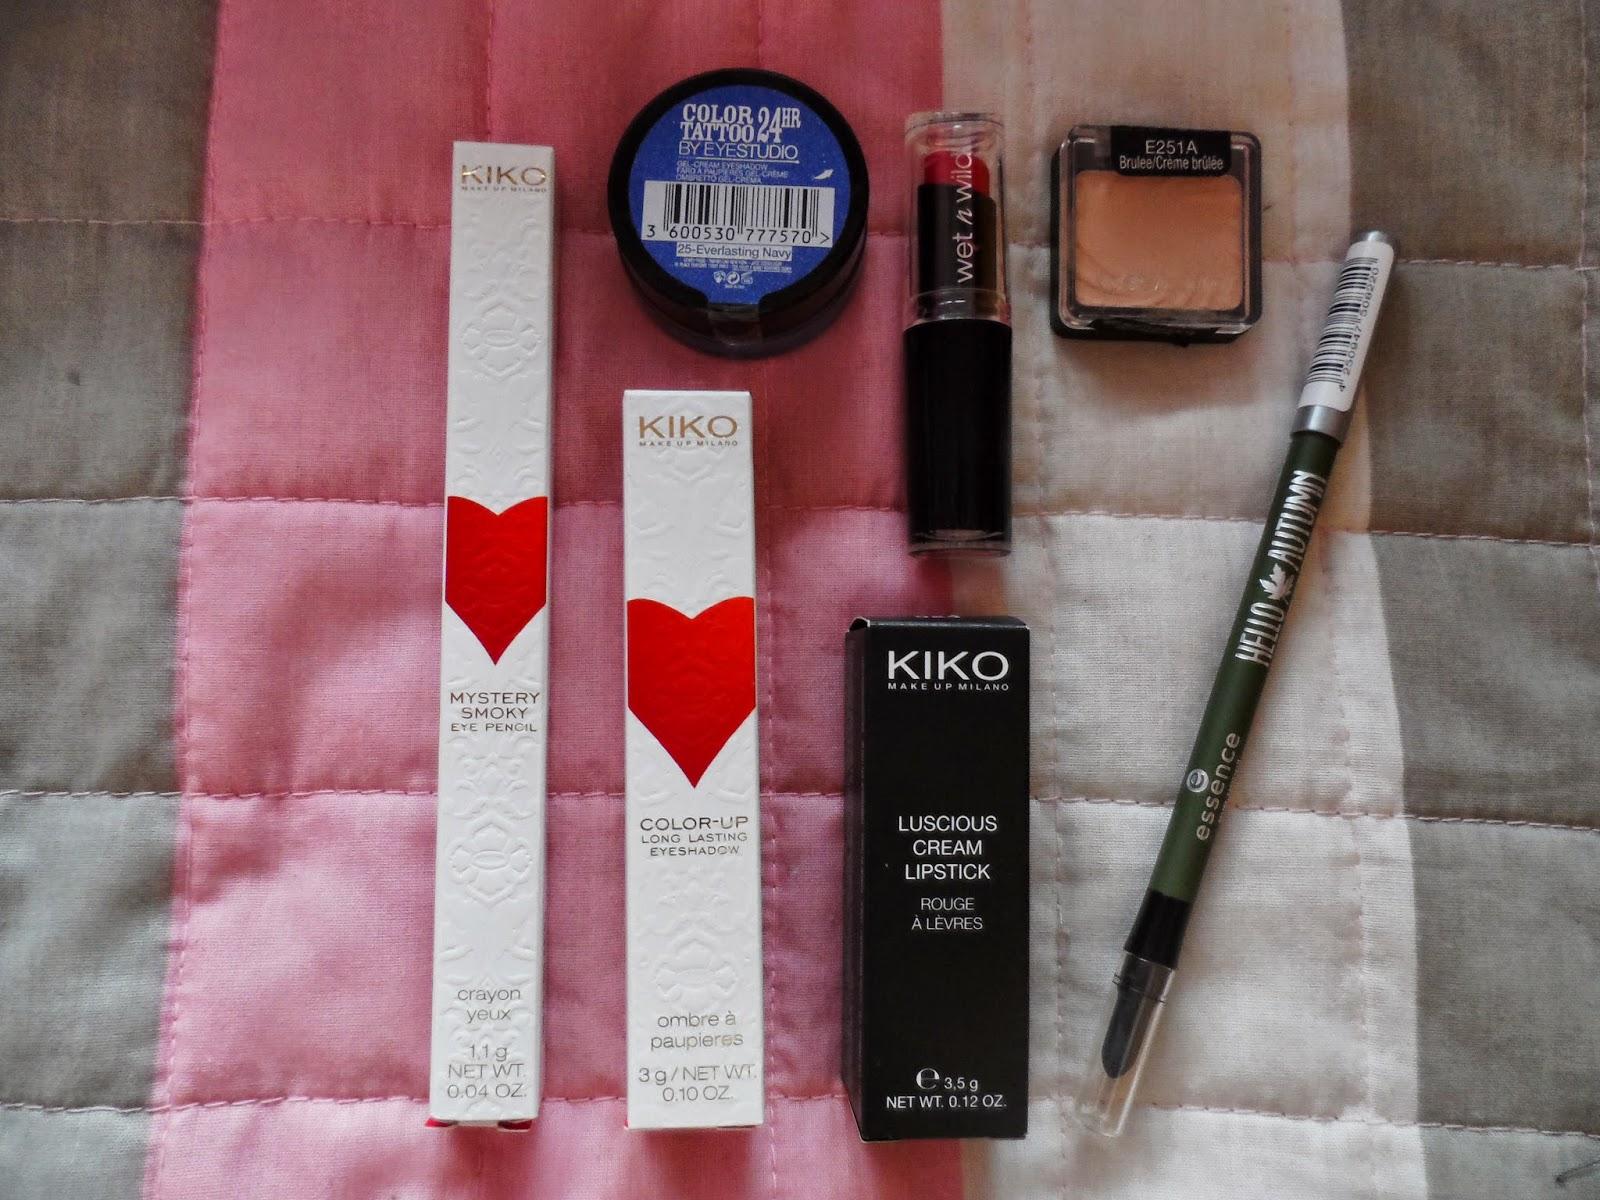 18c853c08bc Sayfa: Últimas compras de Maquillaje; Kiko, Essence, Wet n wild ...